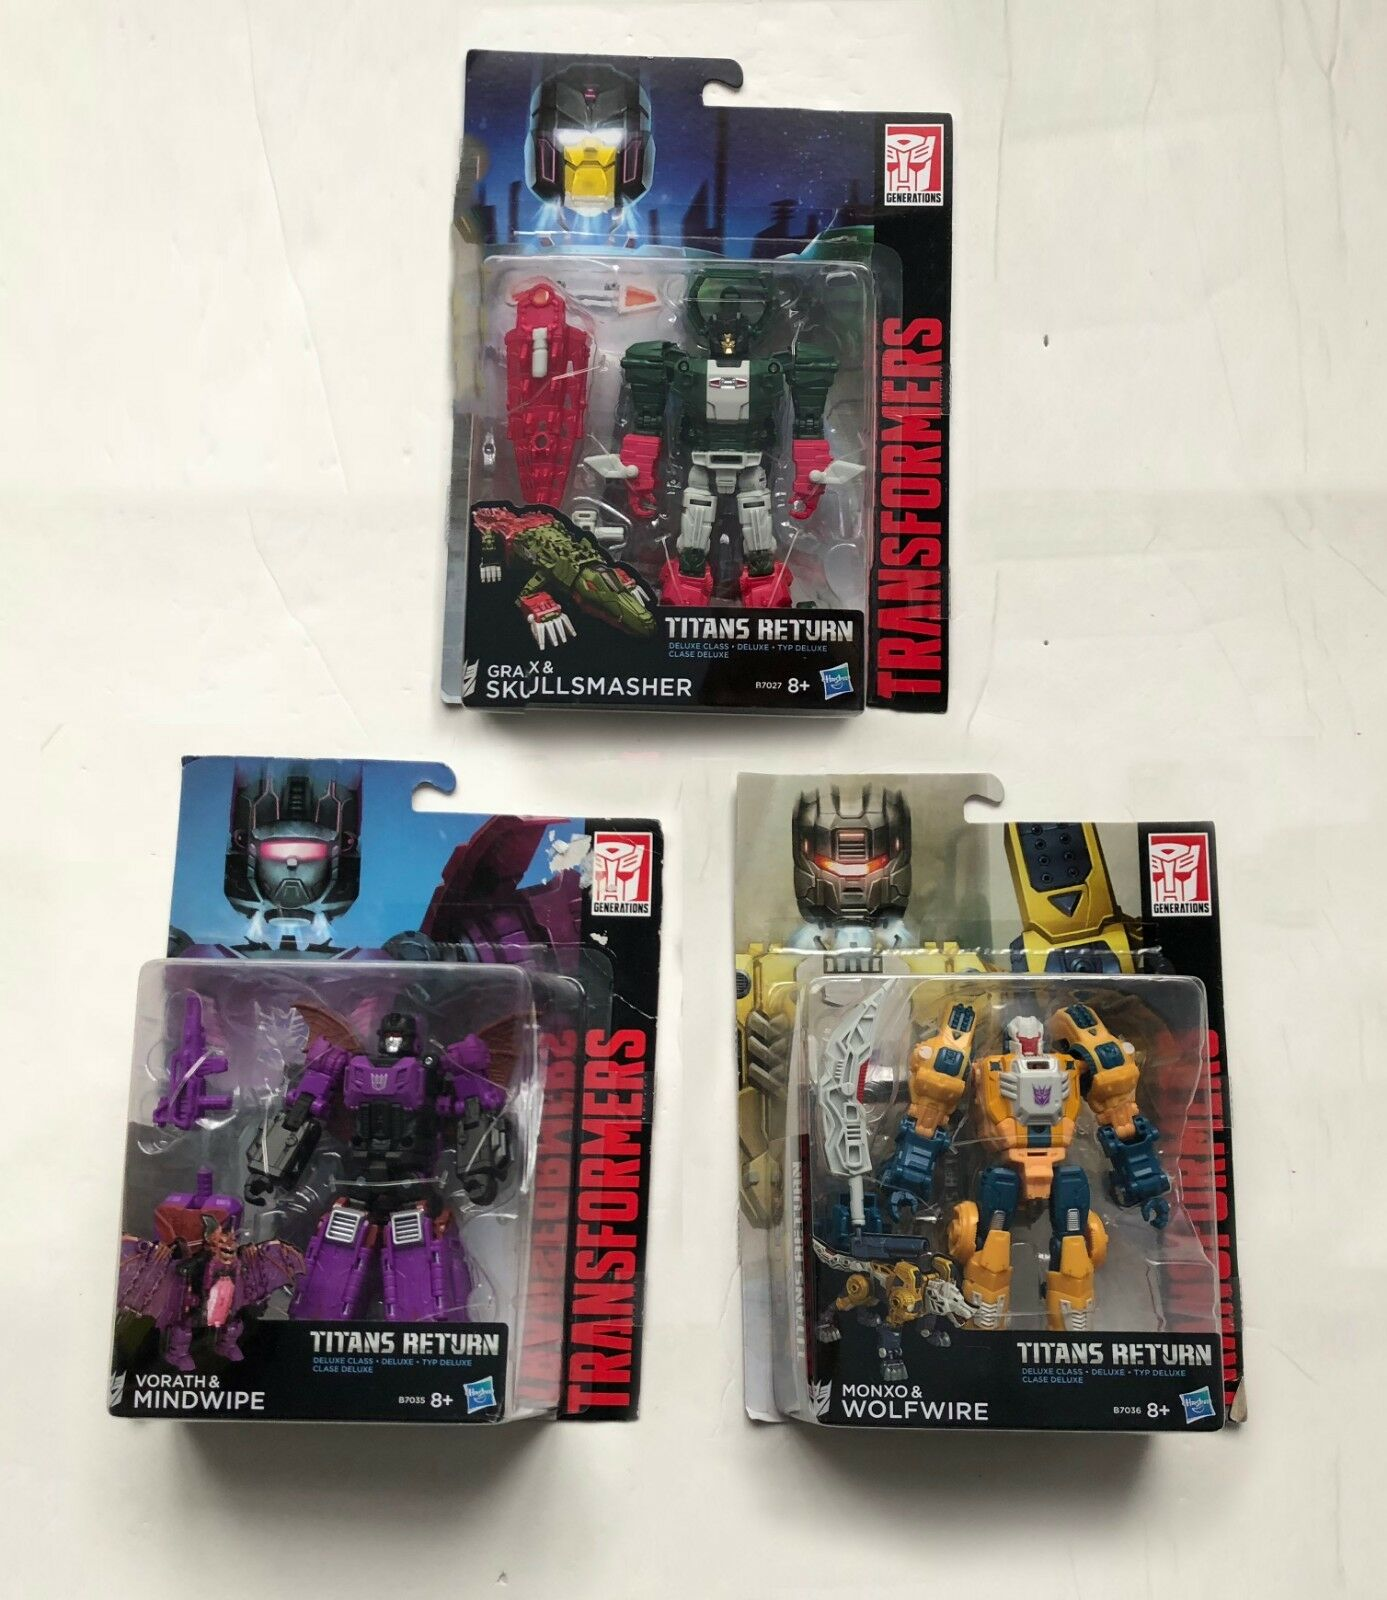 Transformers Titan Returns Deluxe Deluxe Deluxe Wolfwire, Mindwipe and Skullsmasher 870342